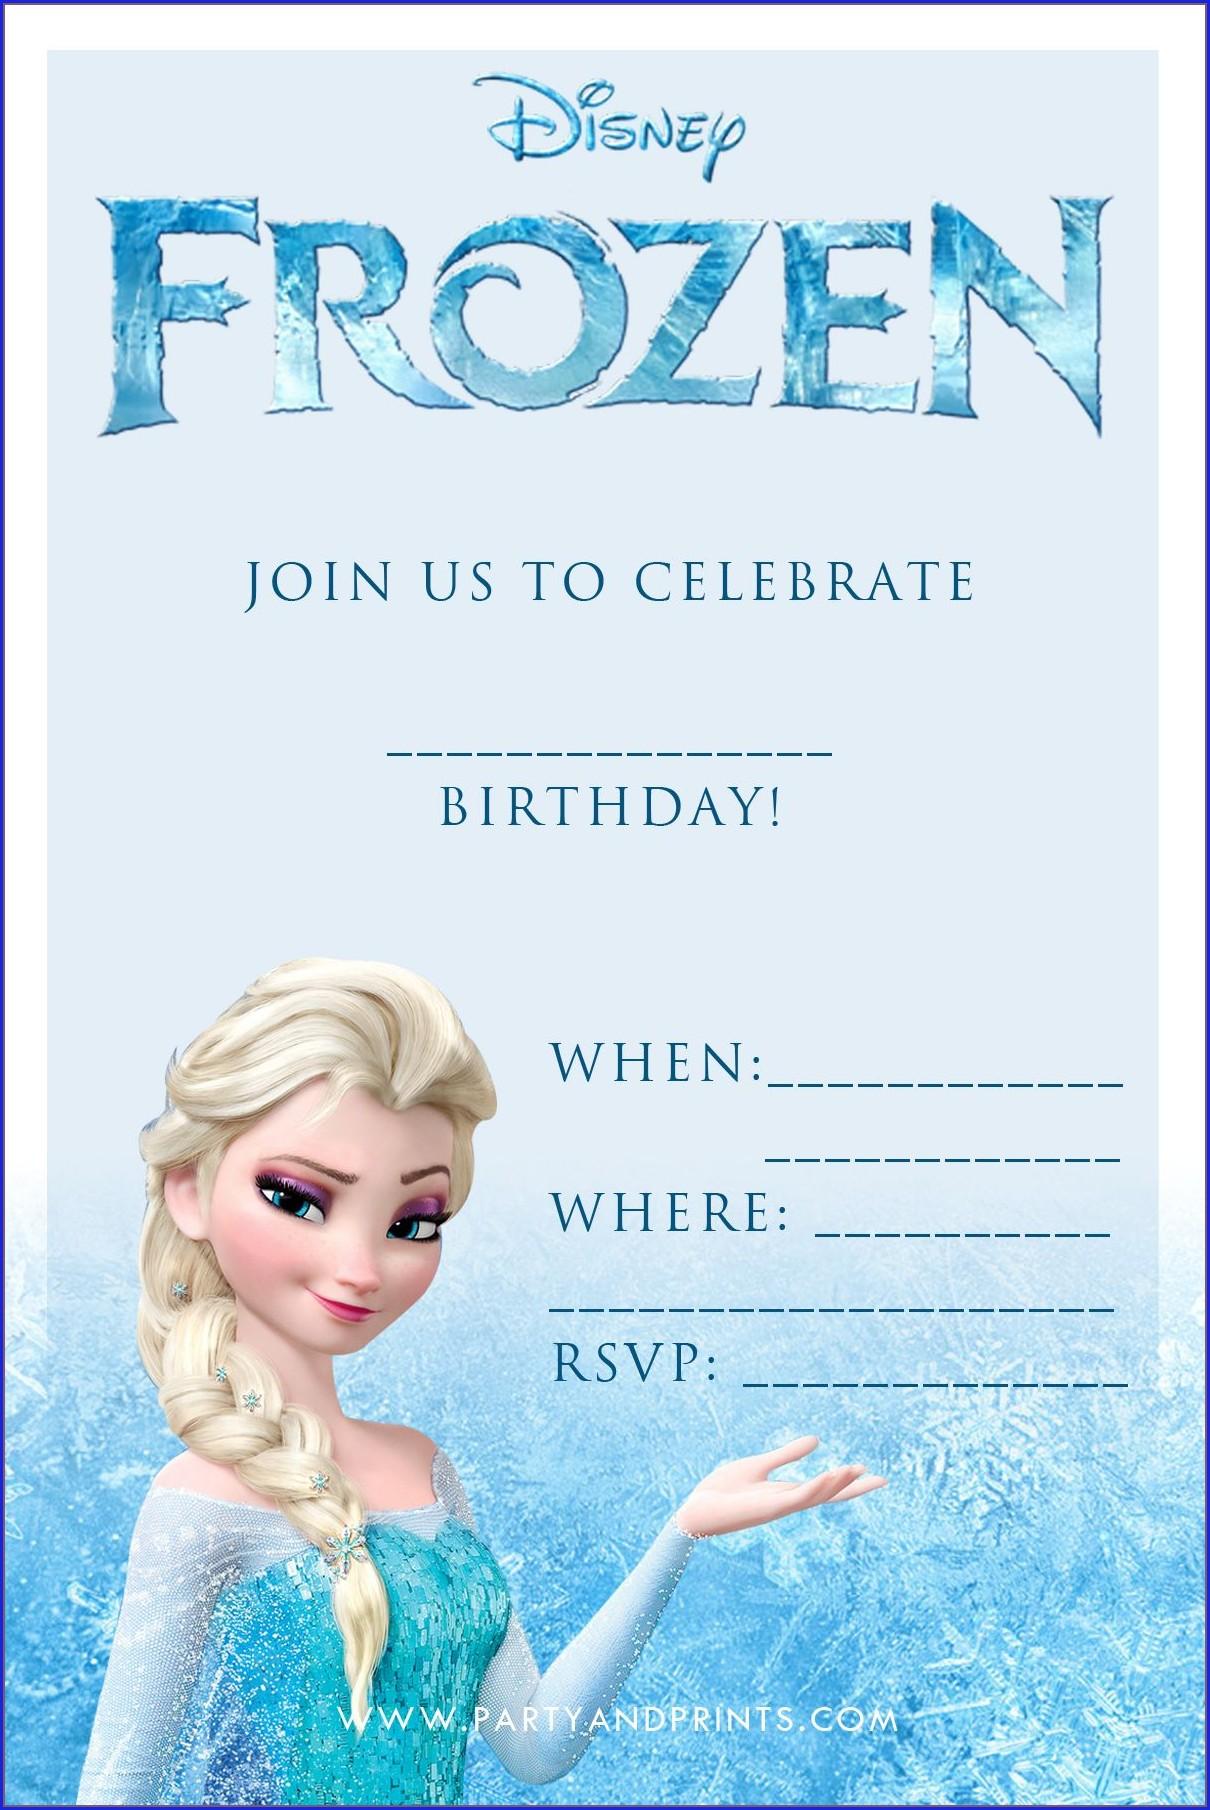 Editable Free Personalized Frozen Invitations